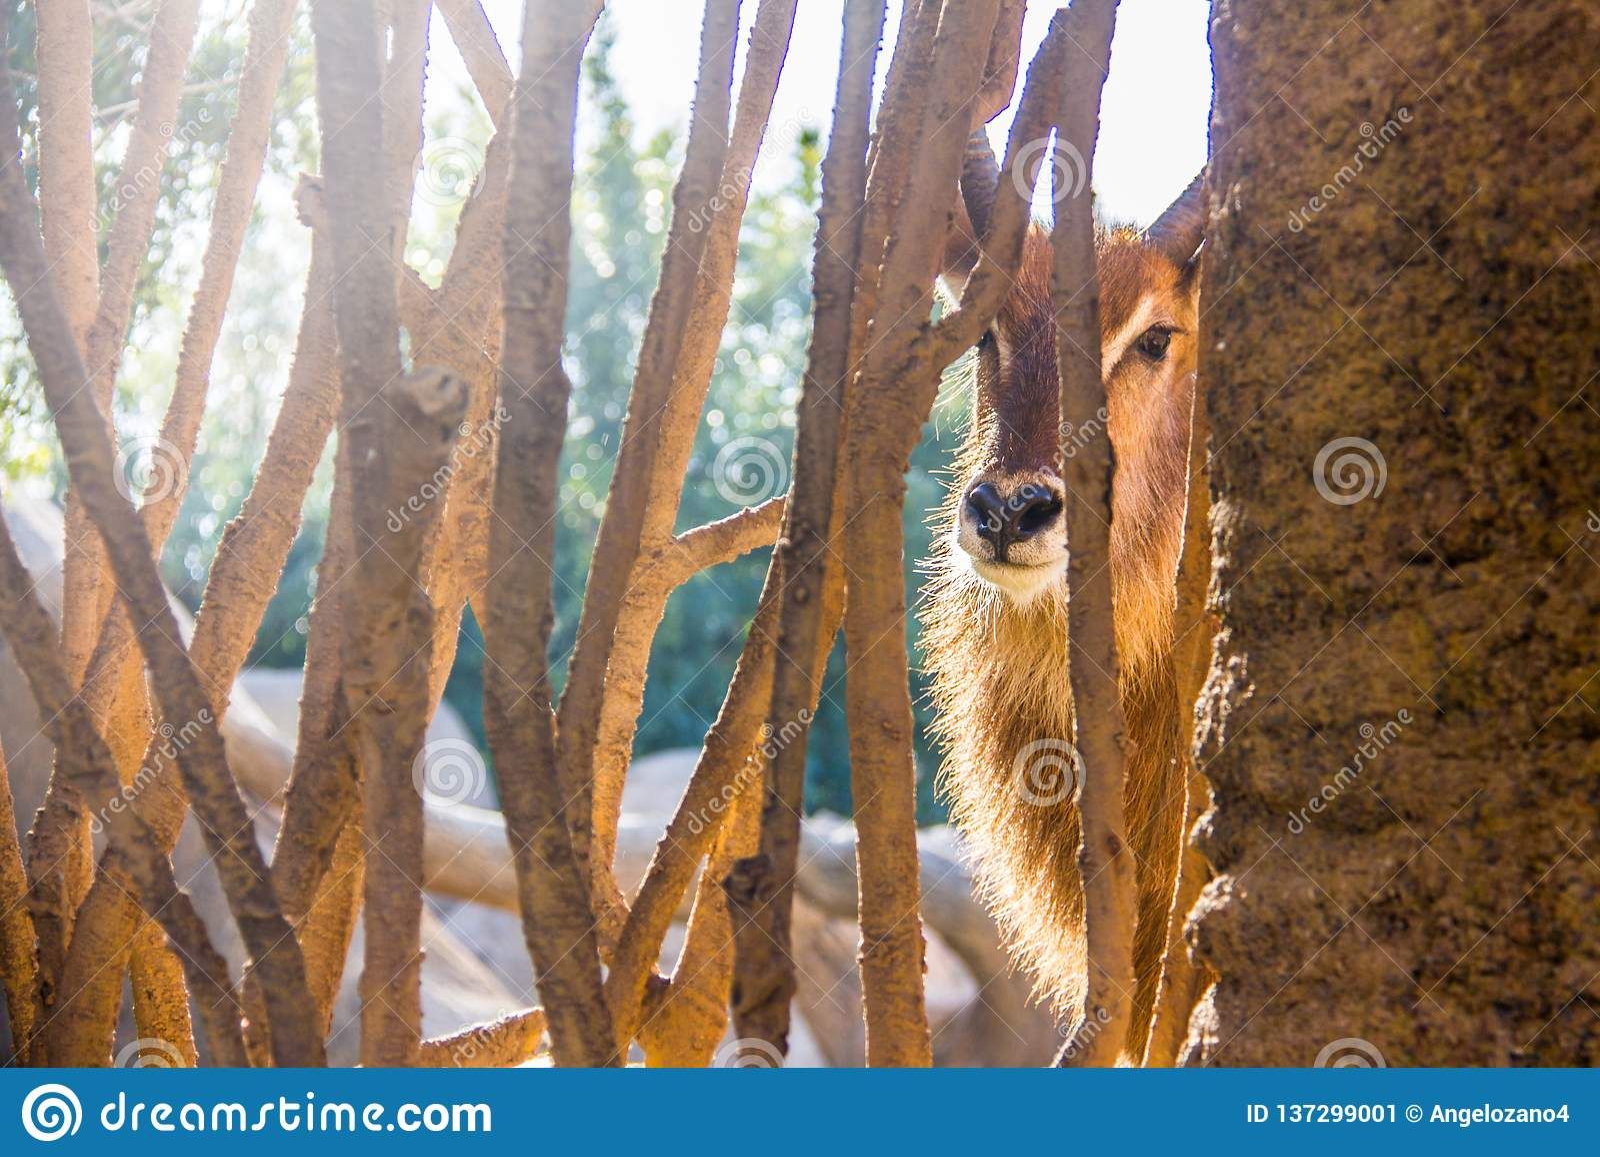 Waterbuck antilop, Kobusellipsiprymnus, bak ett trästaket i en zoo